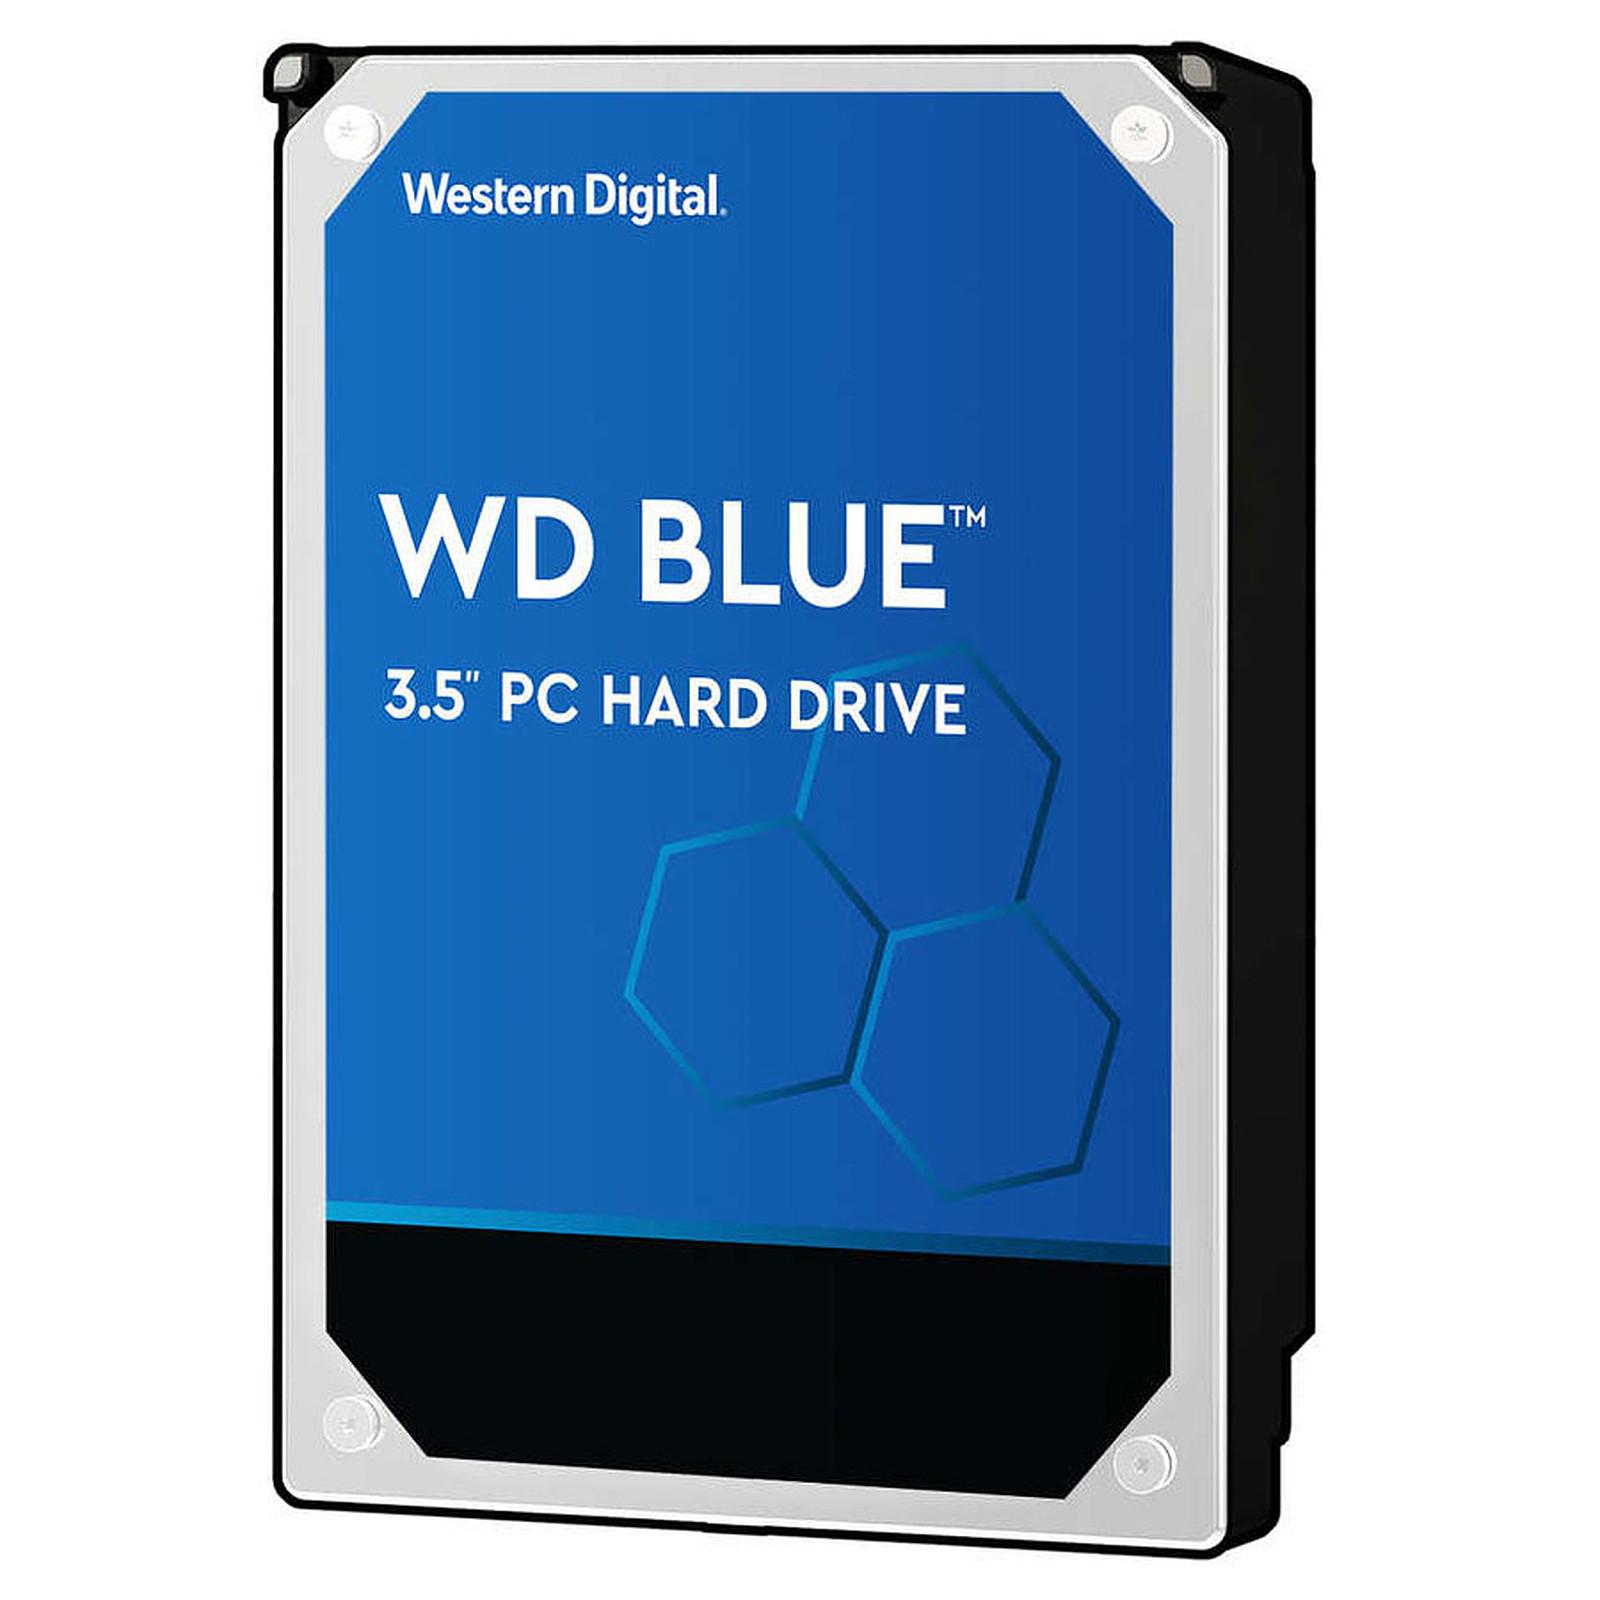 "Disque dur interne 3.5"" Western Digital WD Blue - 1 To, 7200 tr/min, CMR (WD10EZEX)"